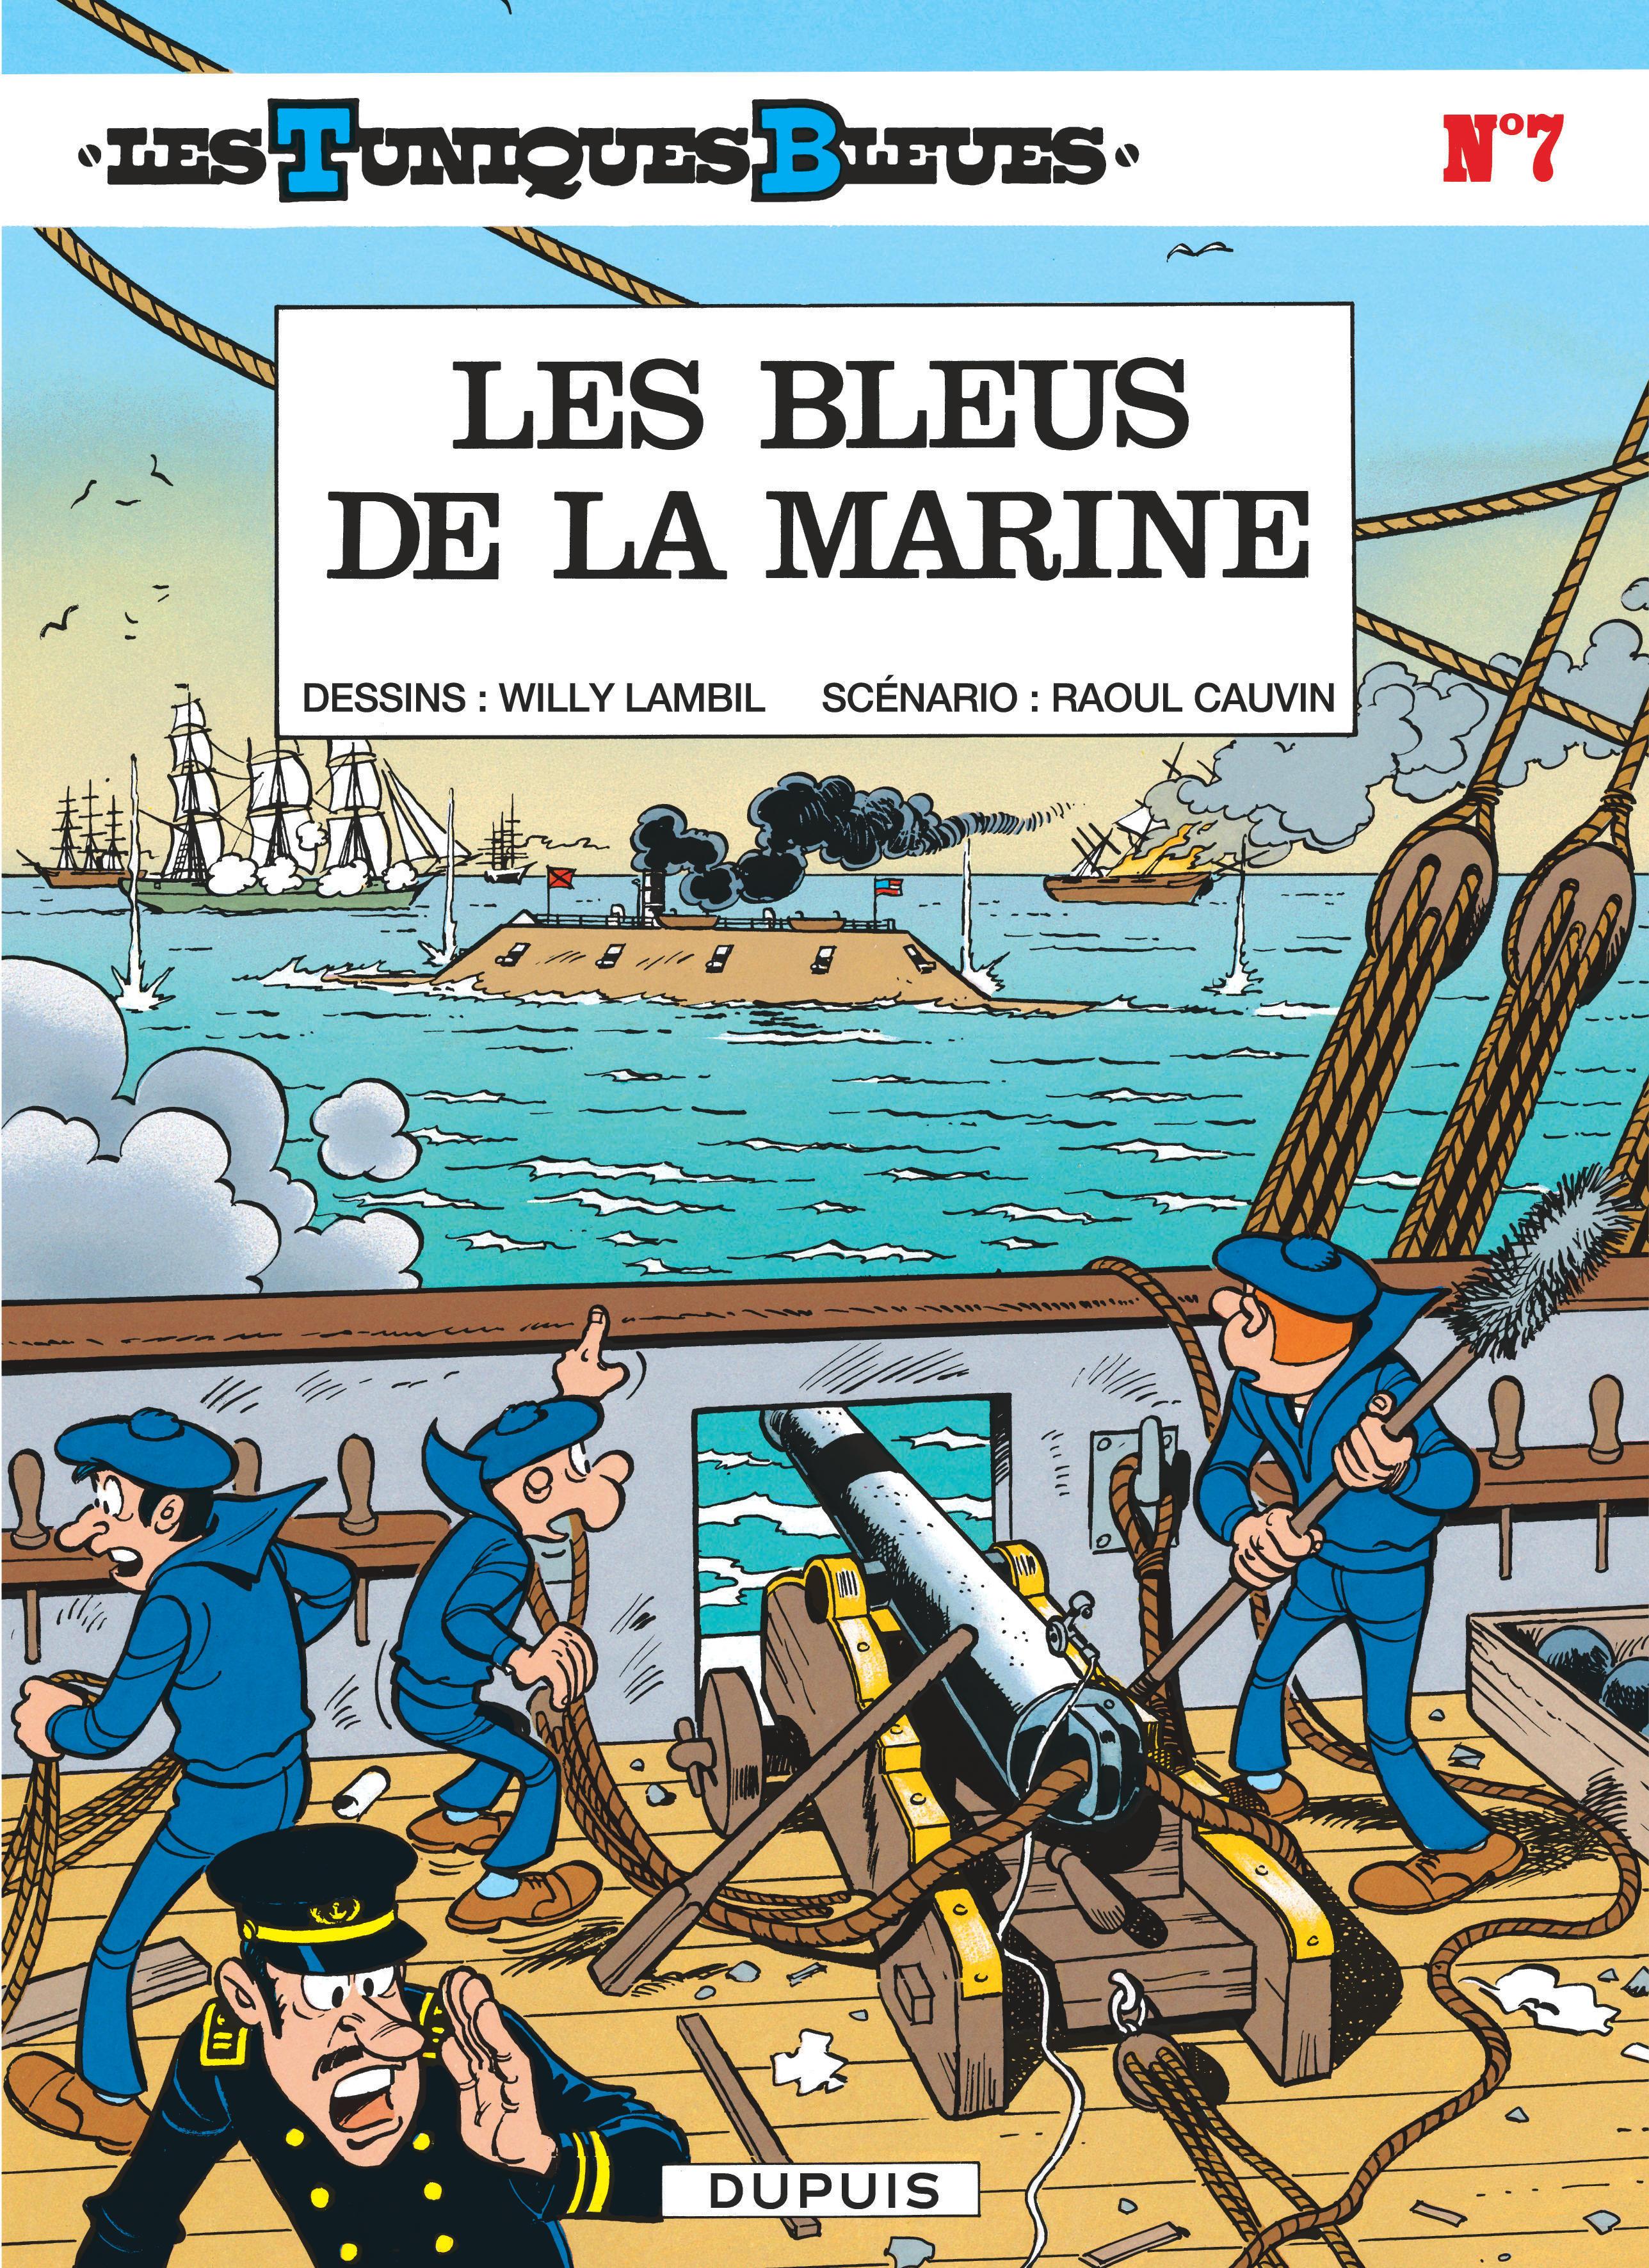 LES BLEUS DE LA MARINE - LES TUNIQUES BLEUES - T7